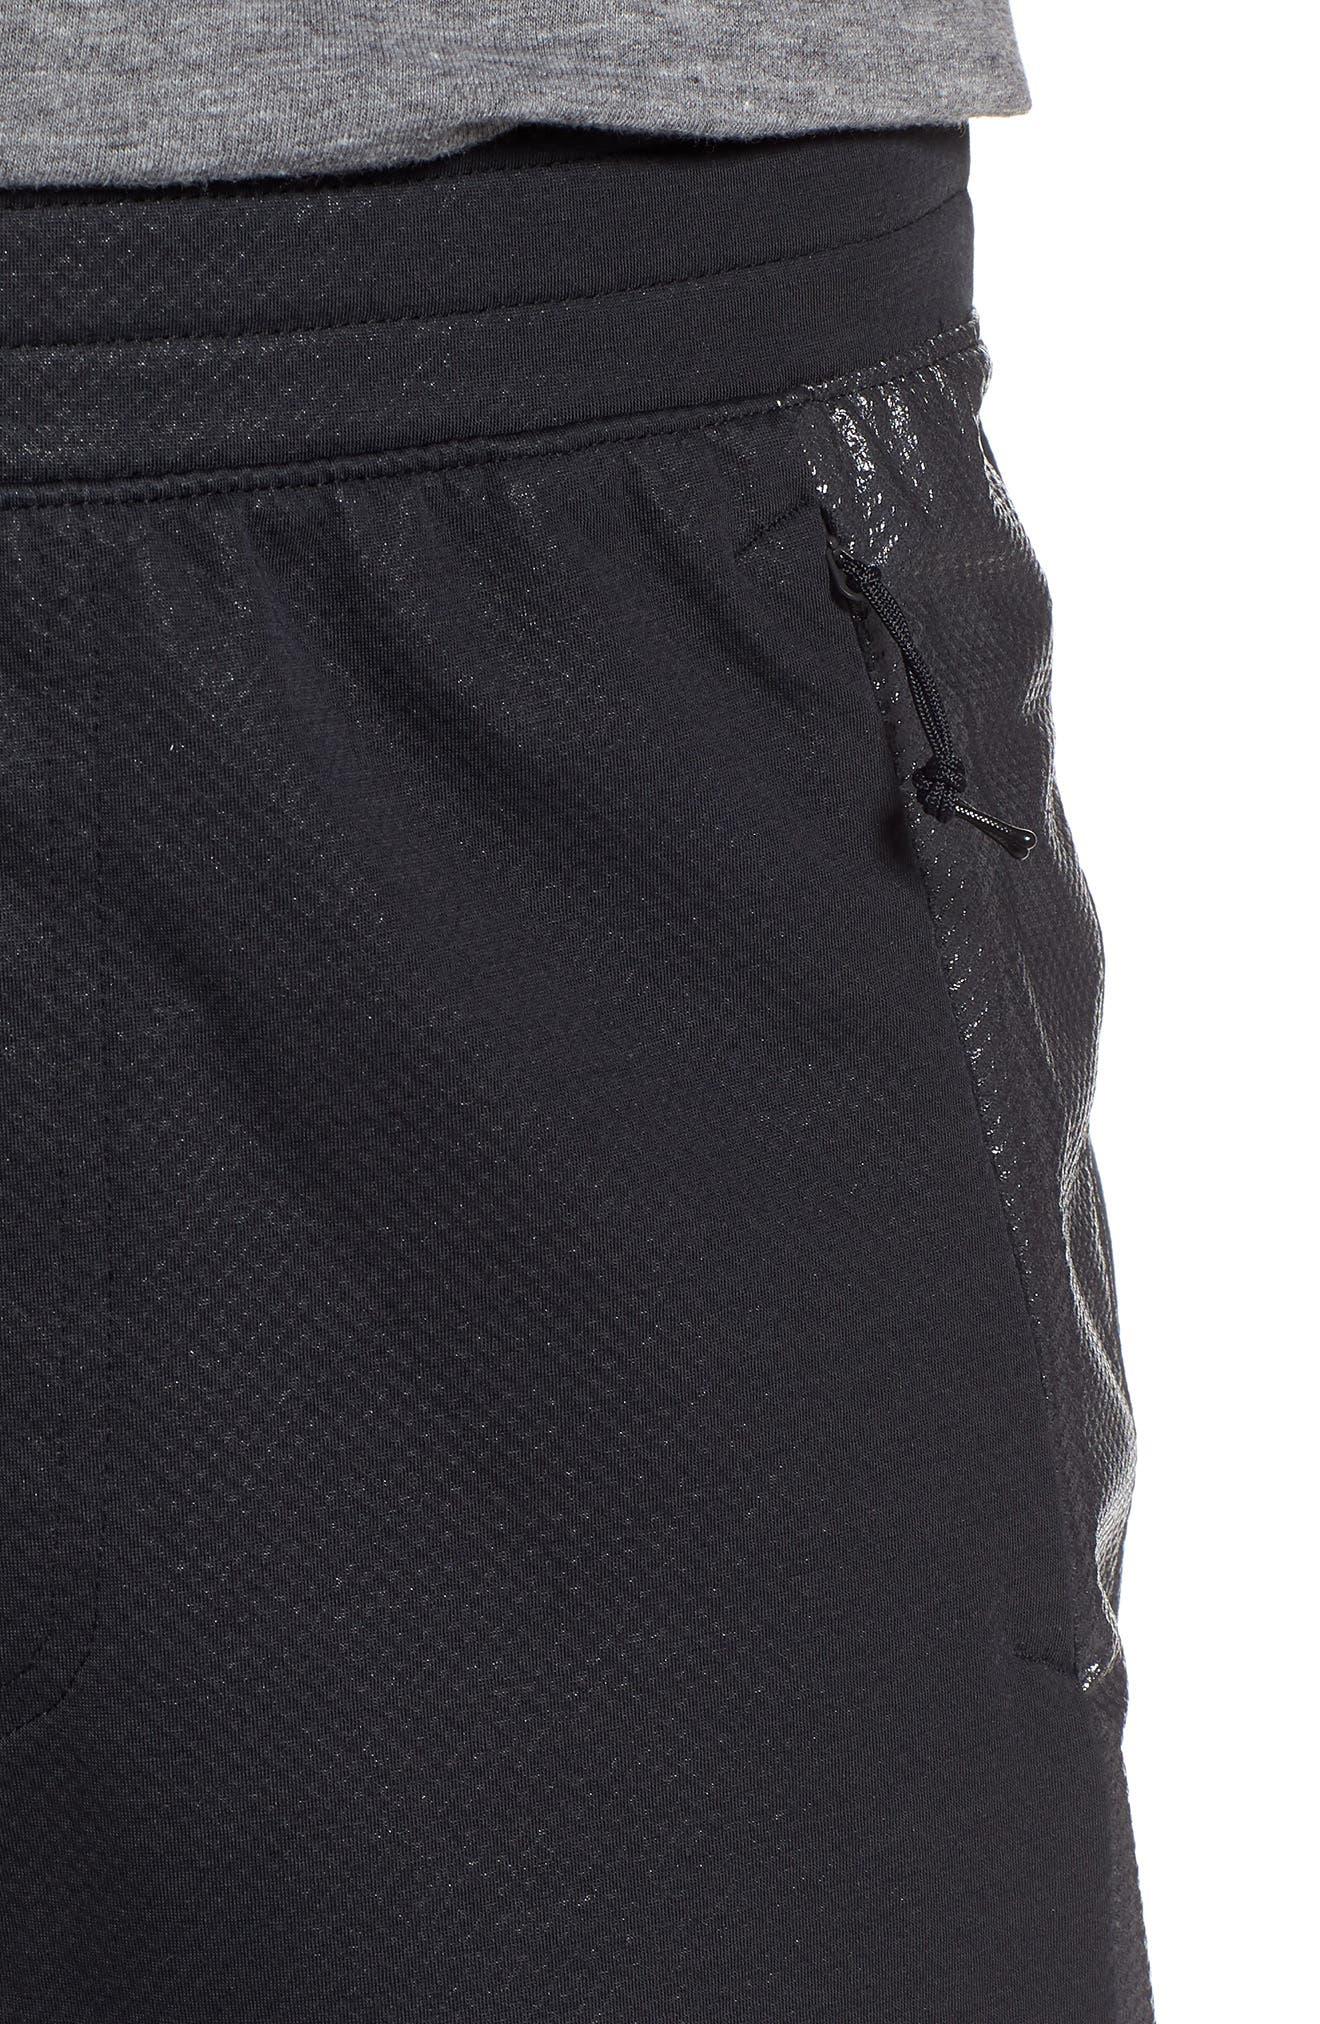 Unstoppable Swacket Training Pants,                             Alternate thumbnail 4, color,                             BLACK FULL HEATHER/ BLACK